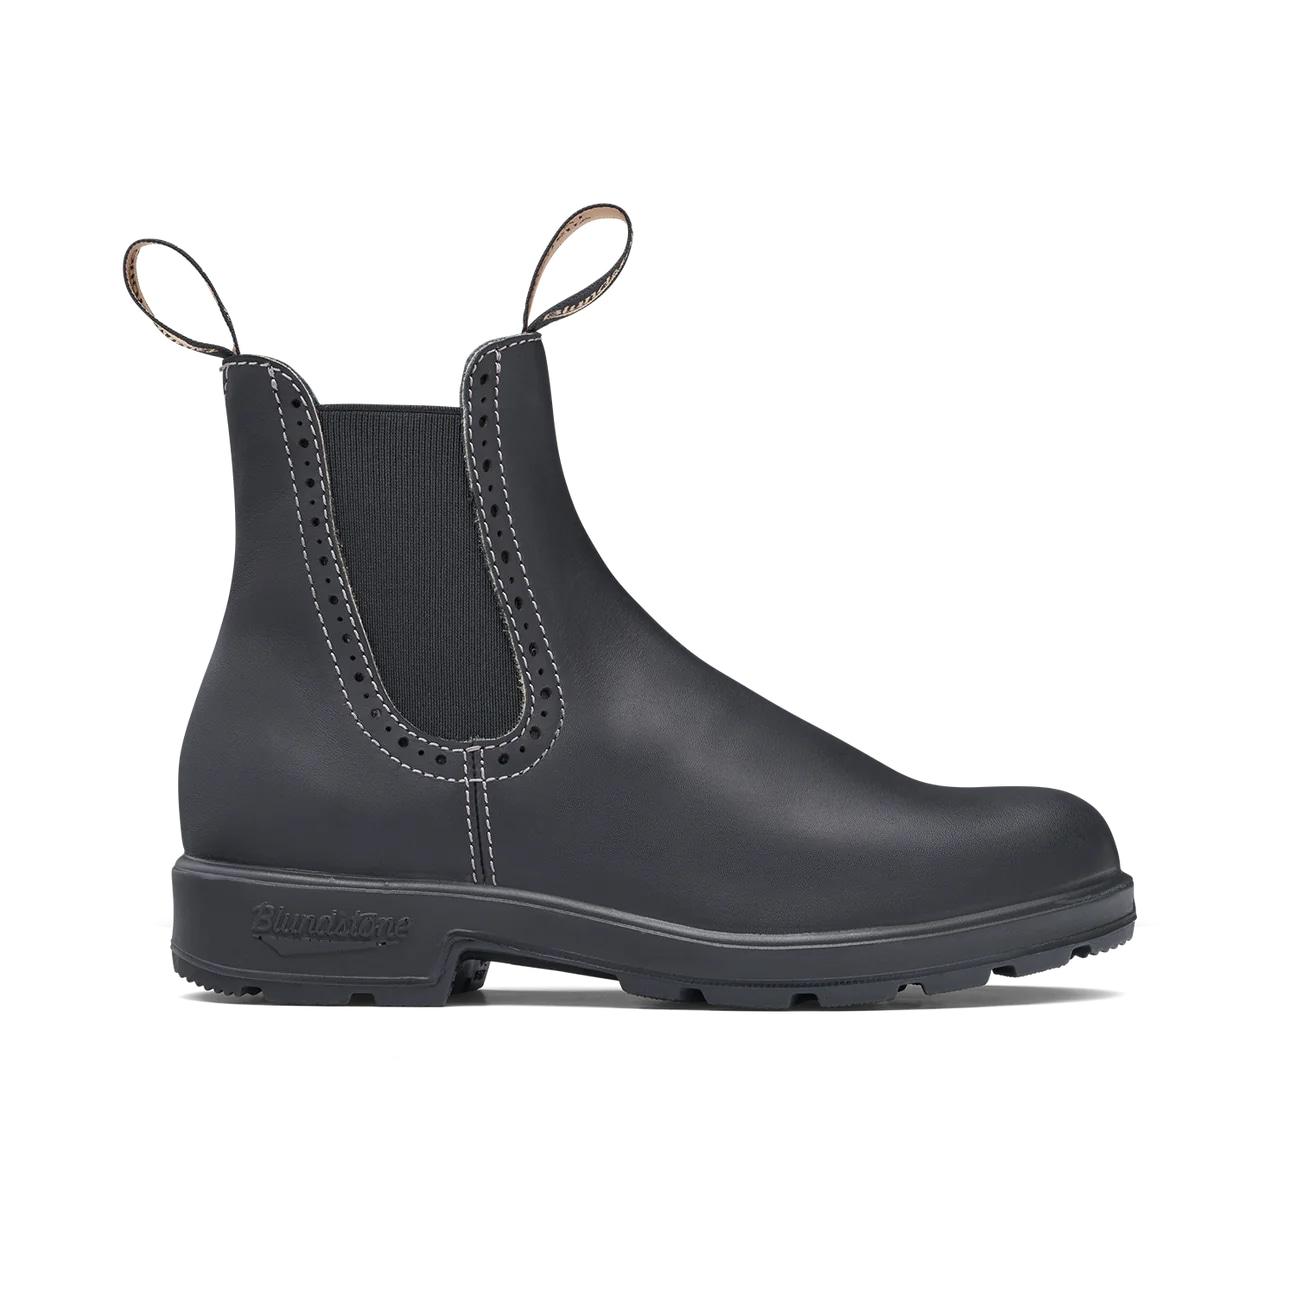 Series Boot Black - Women's